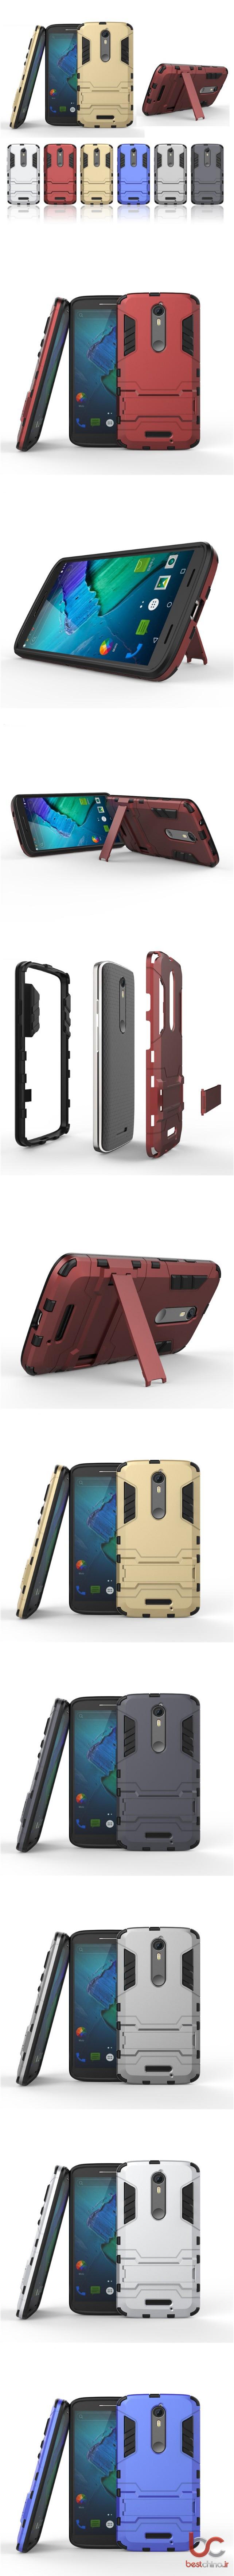 Motorola MOTO X Force tpu back cover (2)